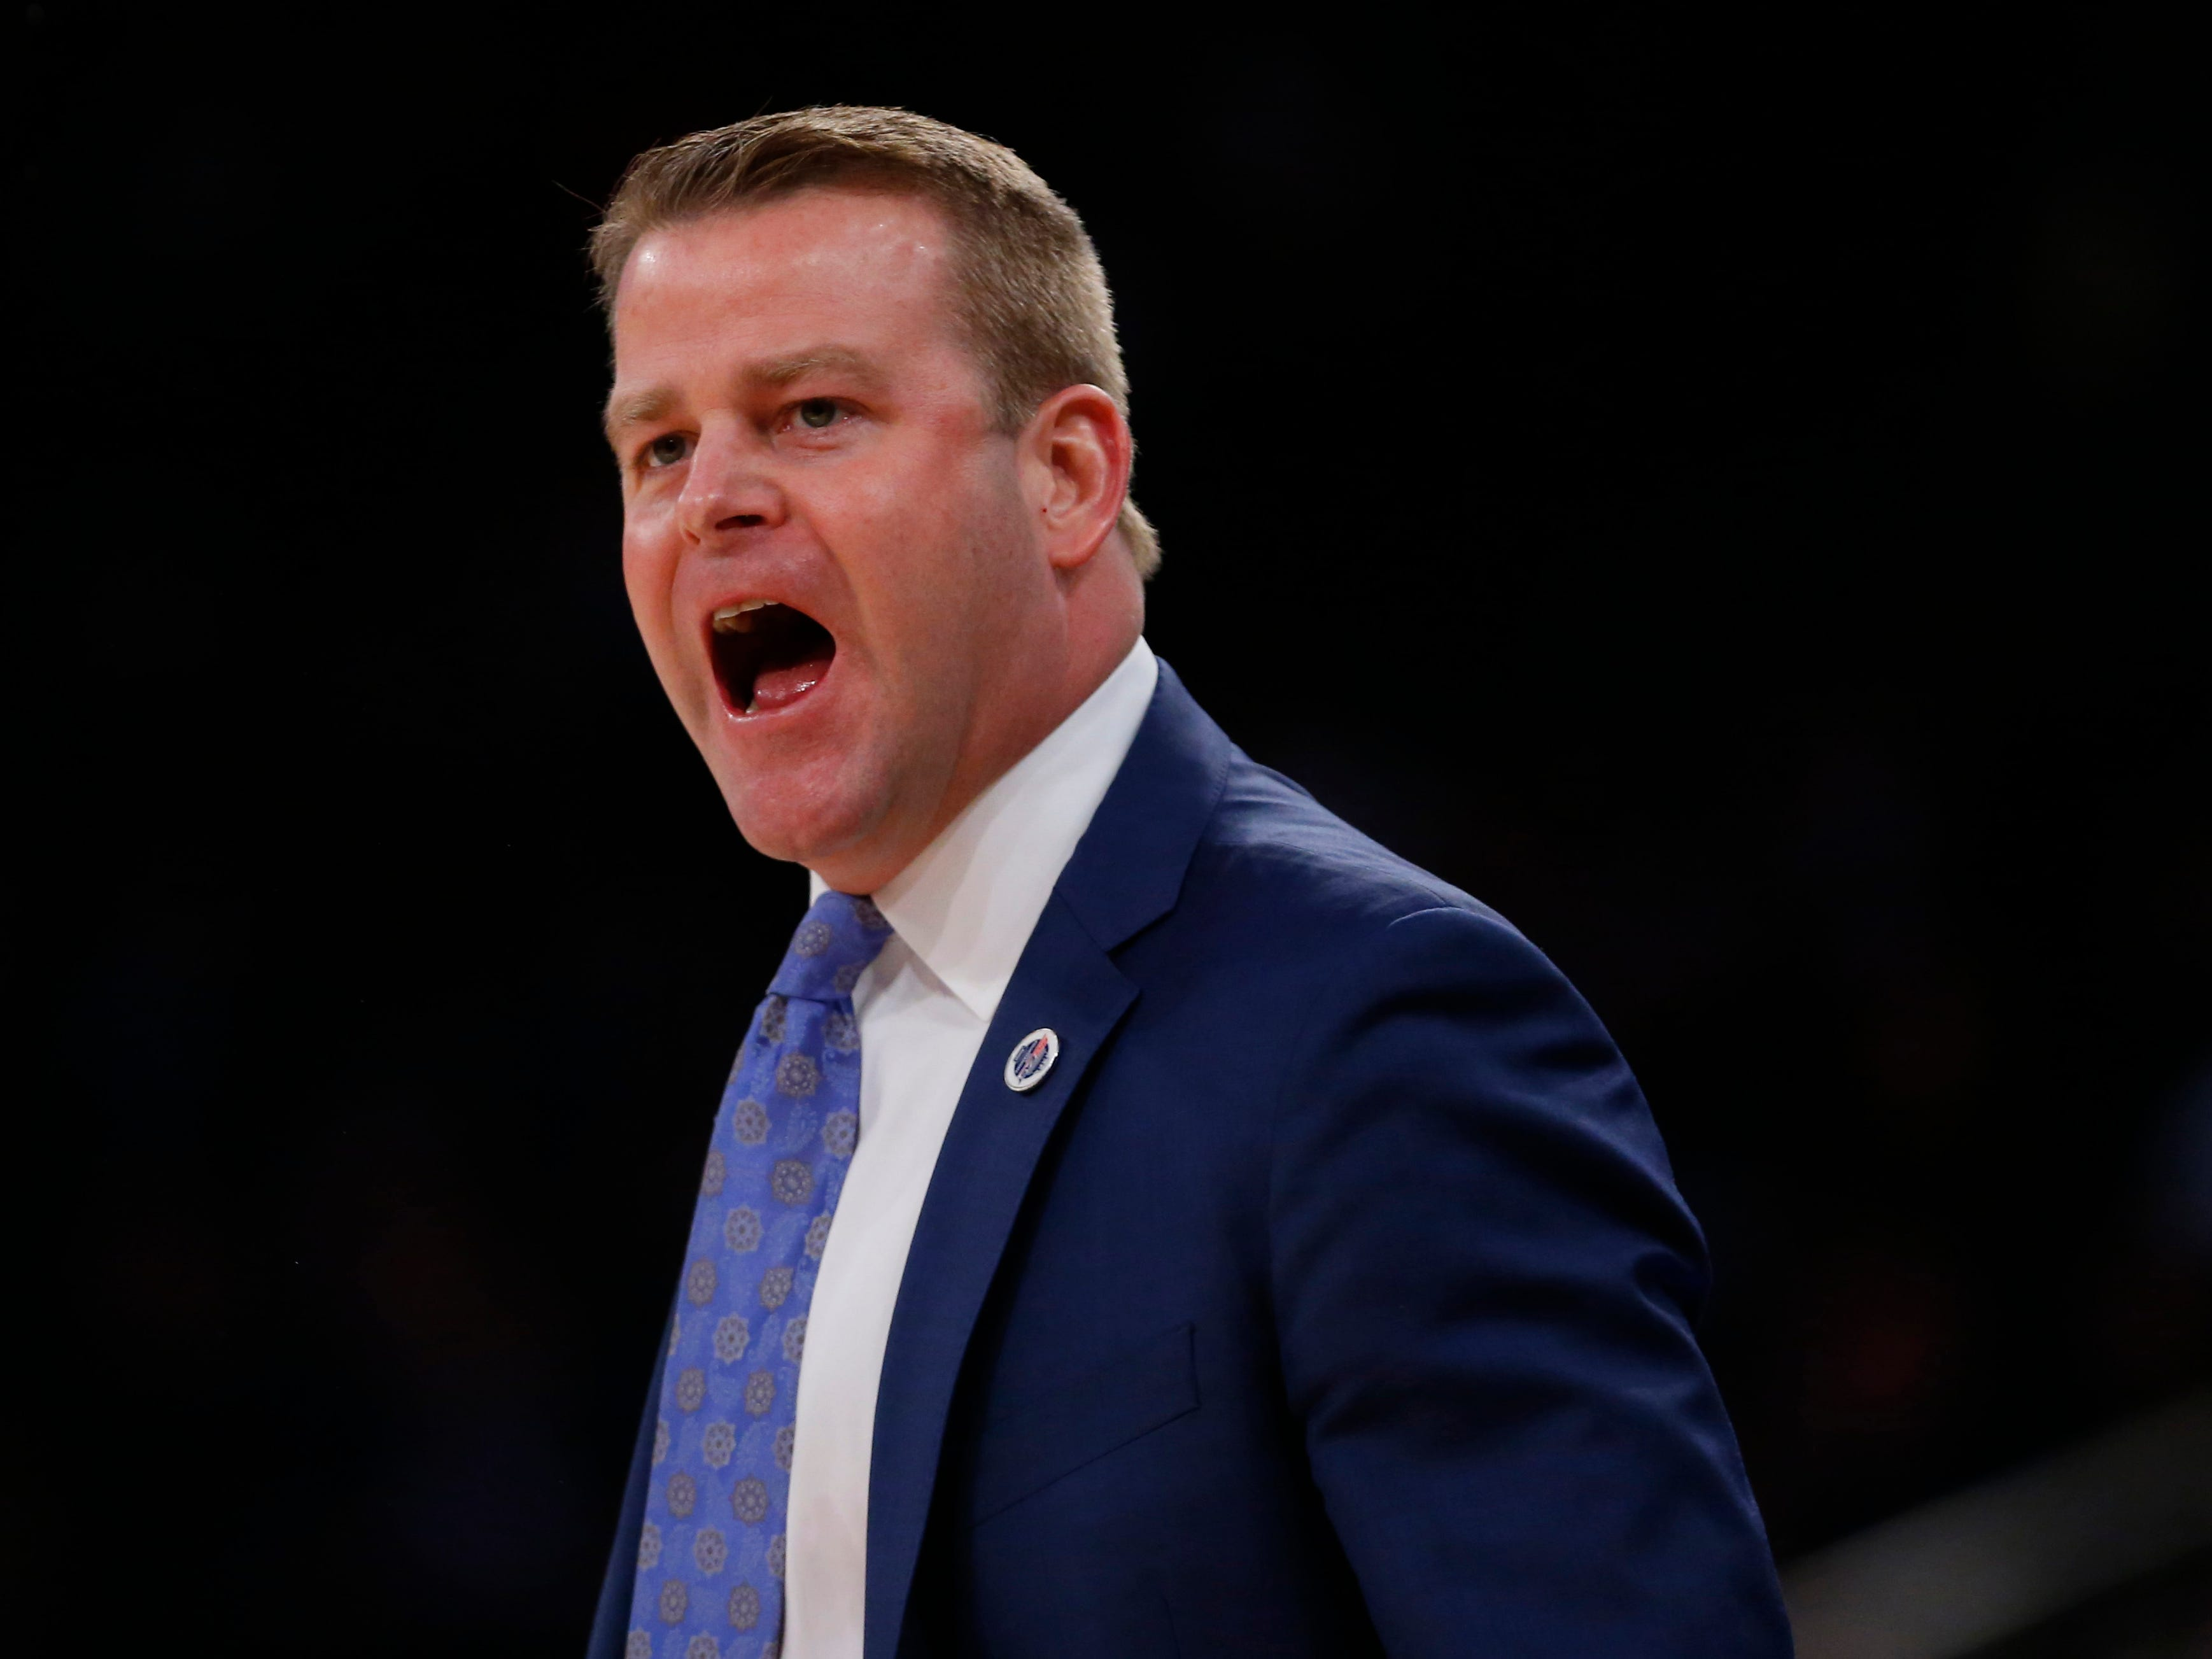 Marquette head coach Steve Wojciechowski appears unhappy with an official's call.